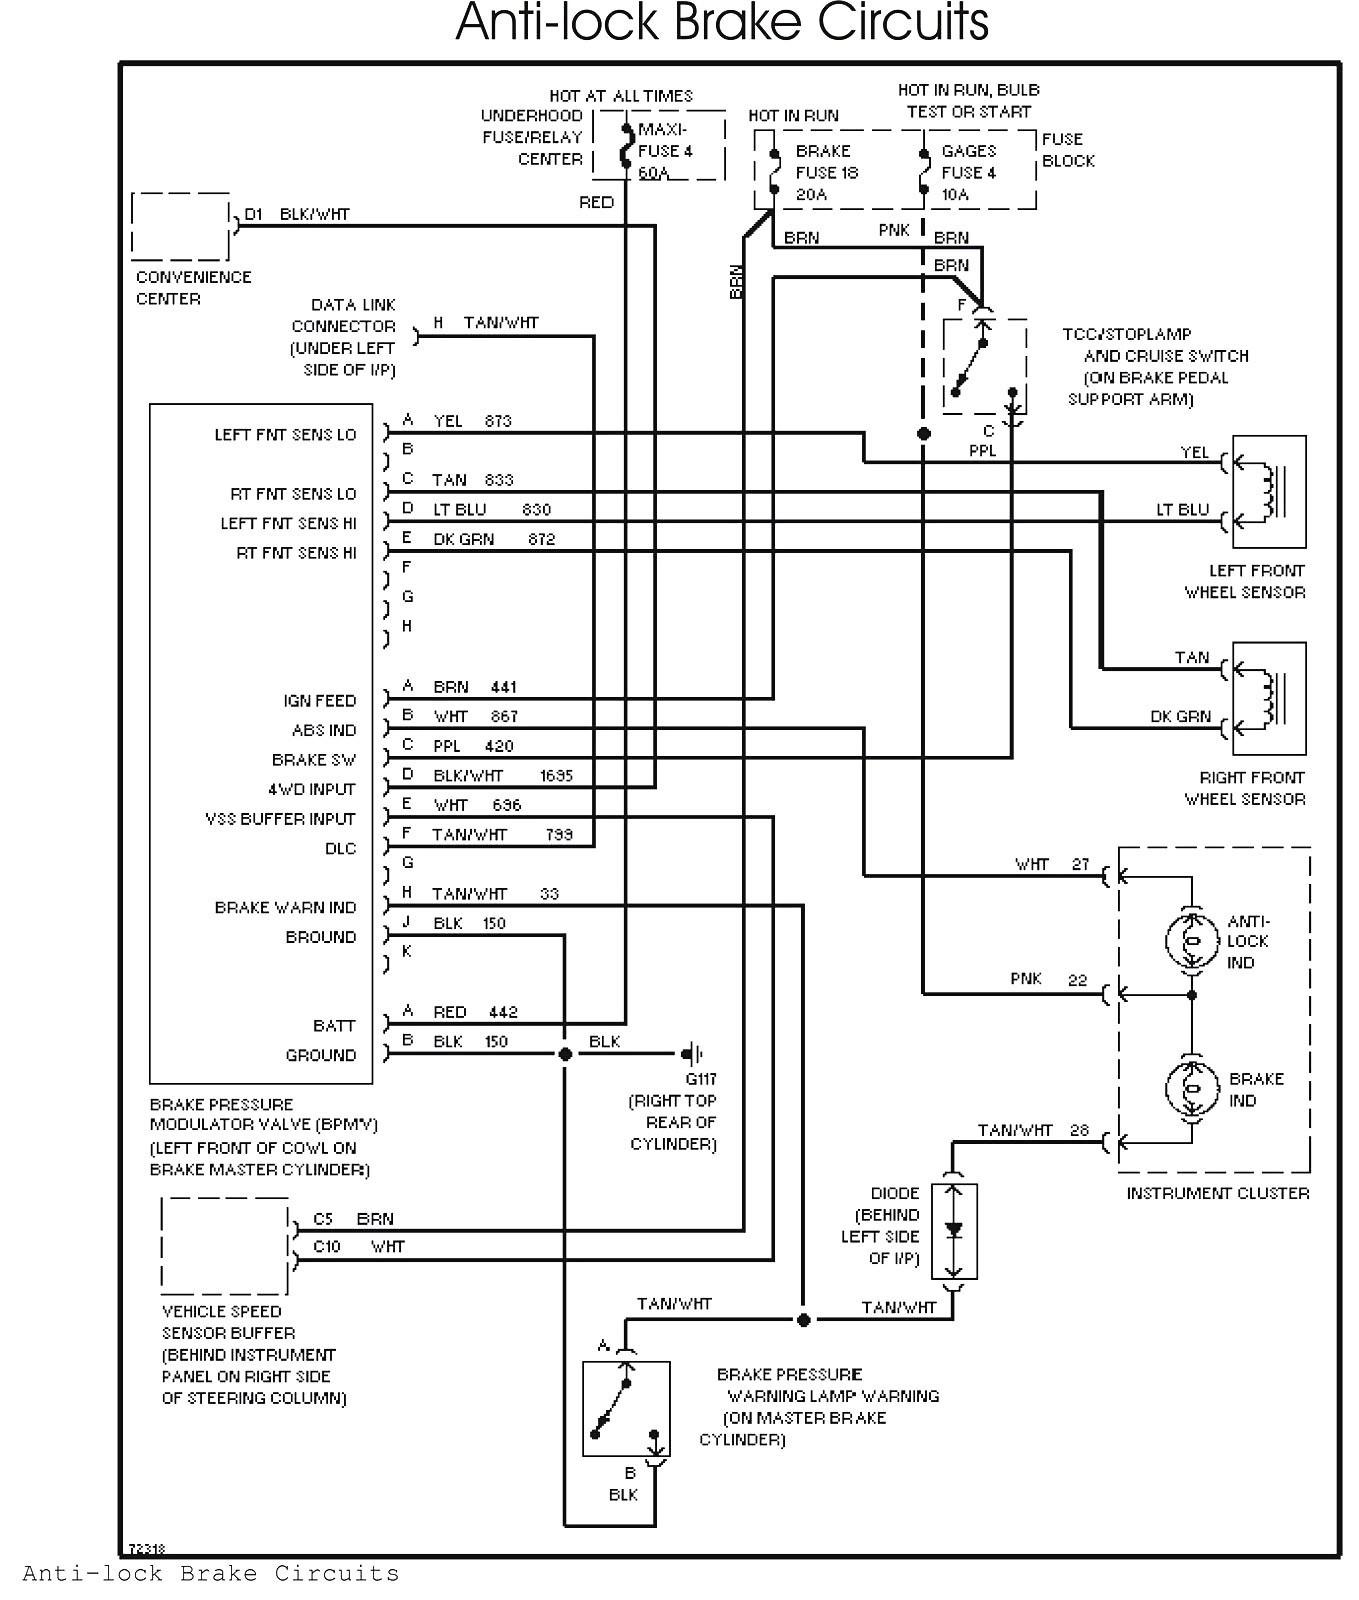 Inspirational the Ener Breakaway System Wiring Diagram ... on breakaway battery wiring, power tech trailer breakaway battery diagram, breakaway cable, chevy brake light switch diagram, breakaway switch diagram,